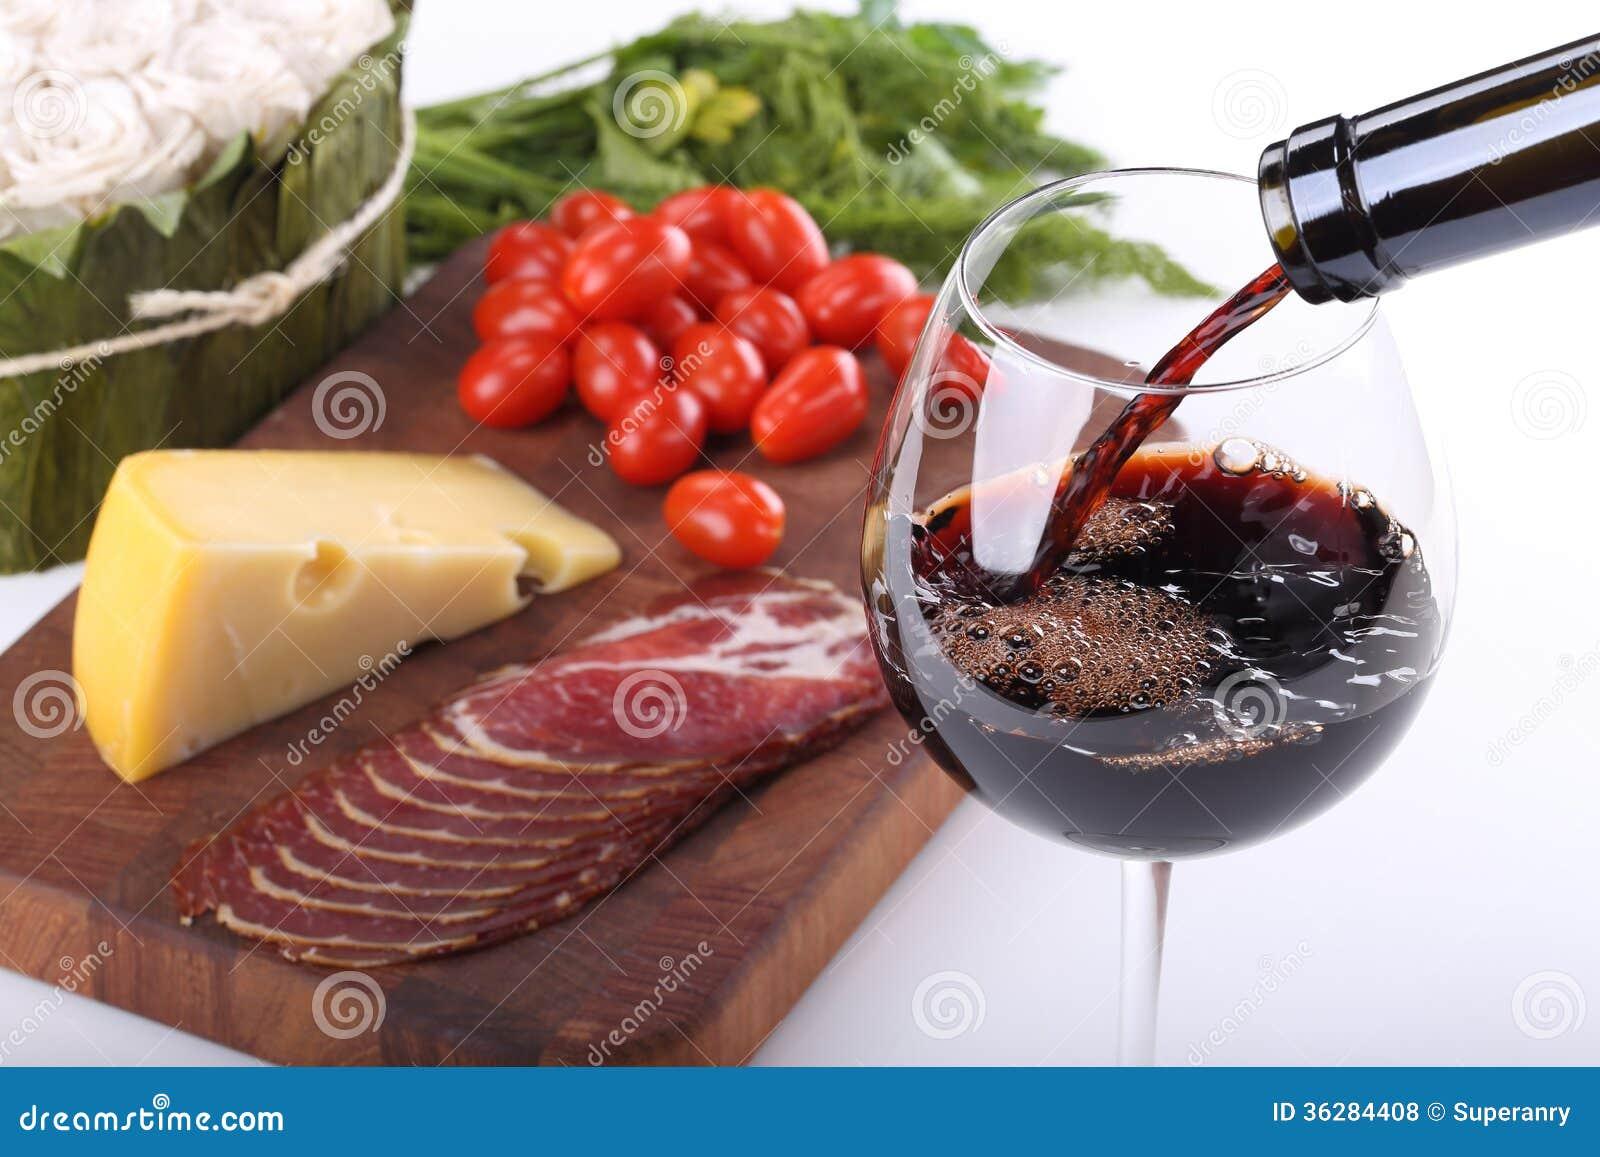 Bachground de versement de vin rouge et de nourriture